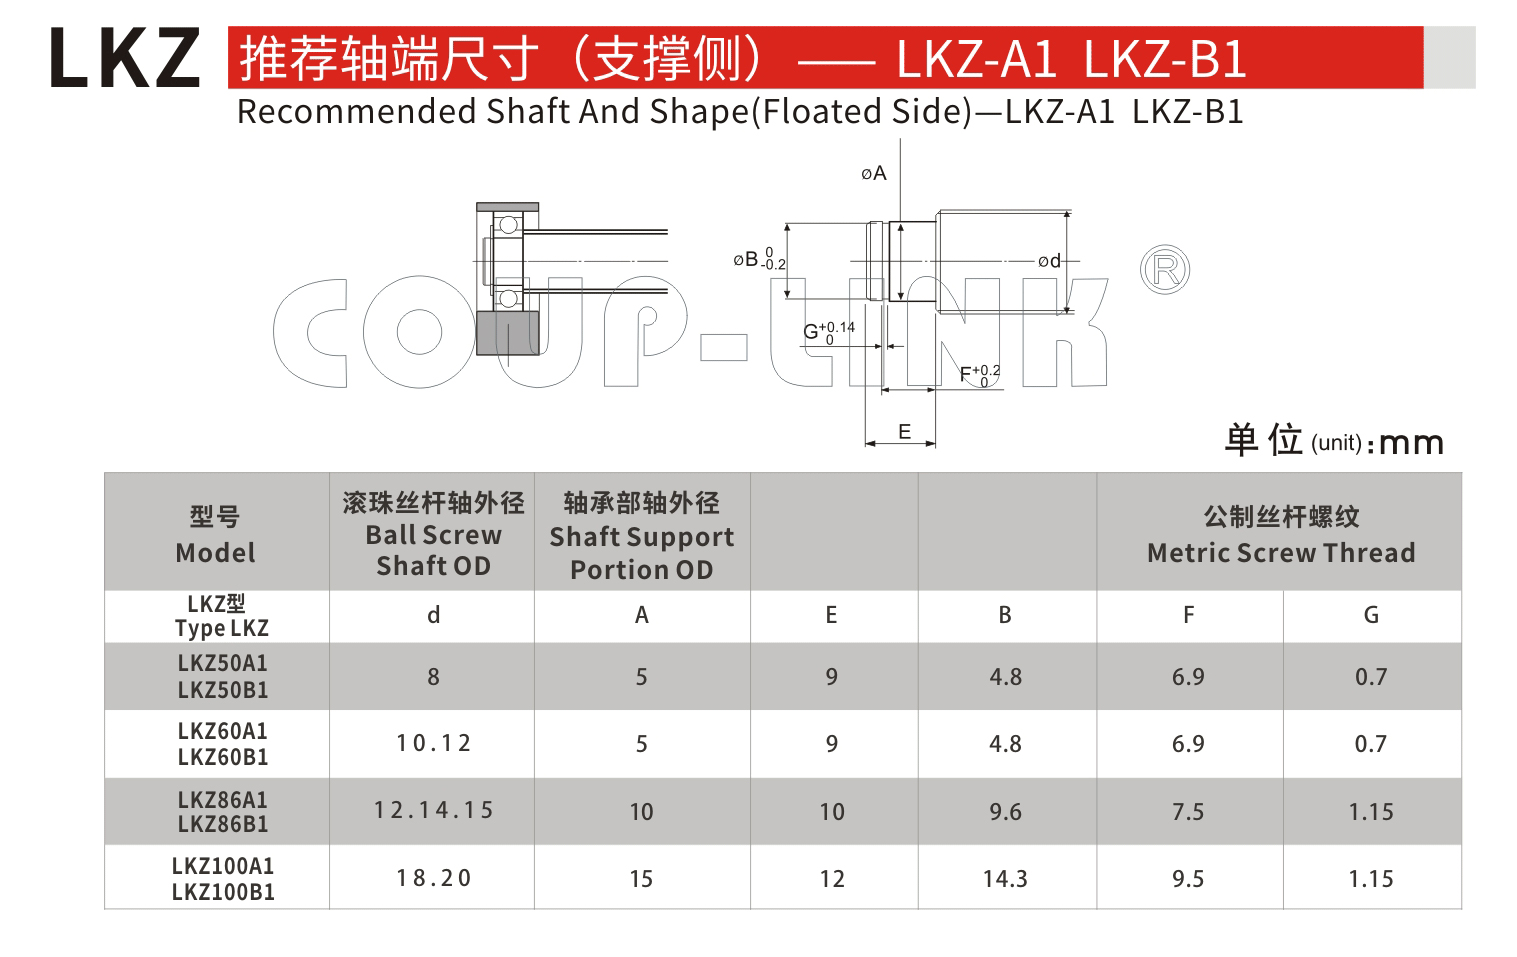 LKZ-A 固定侧_联轴器种类-广州菱科自动化设备有限公司